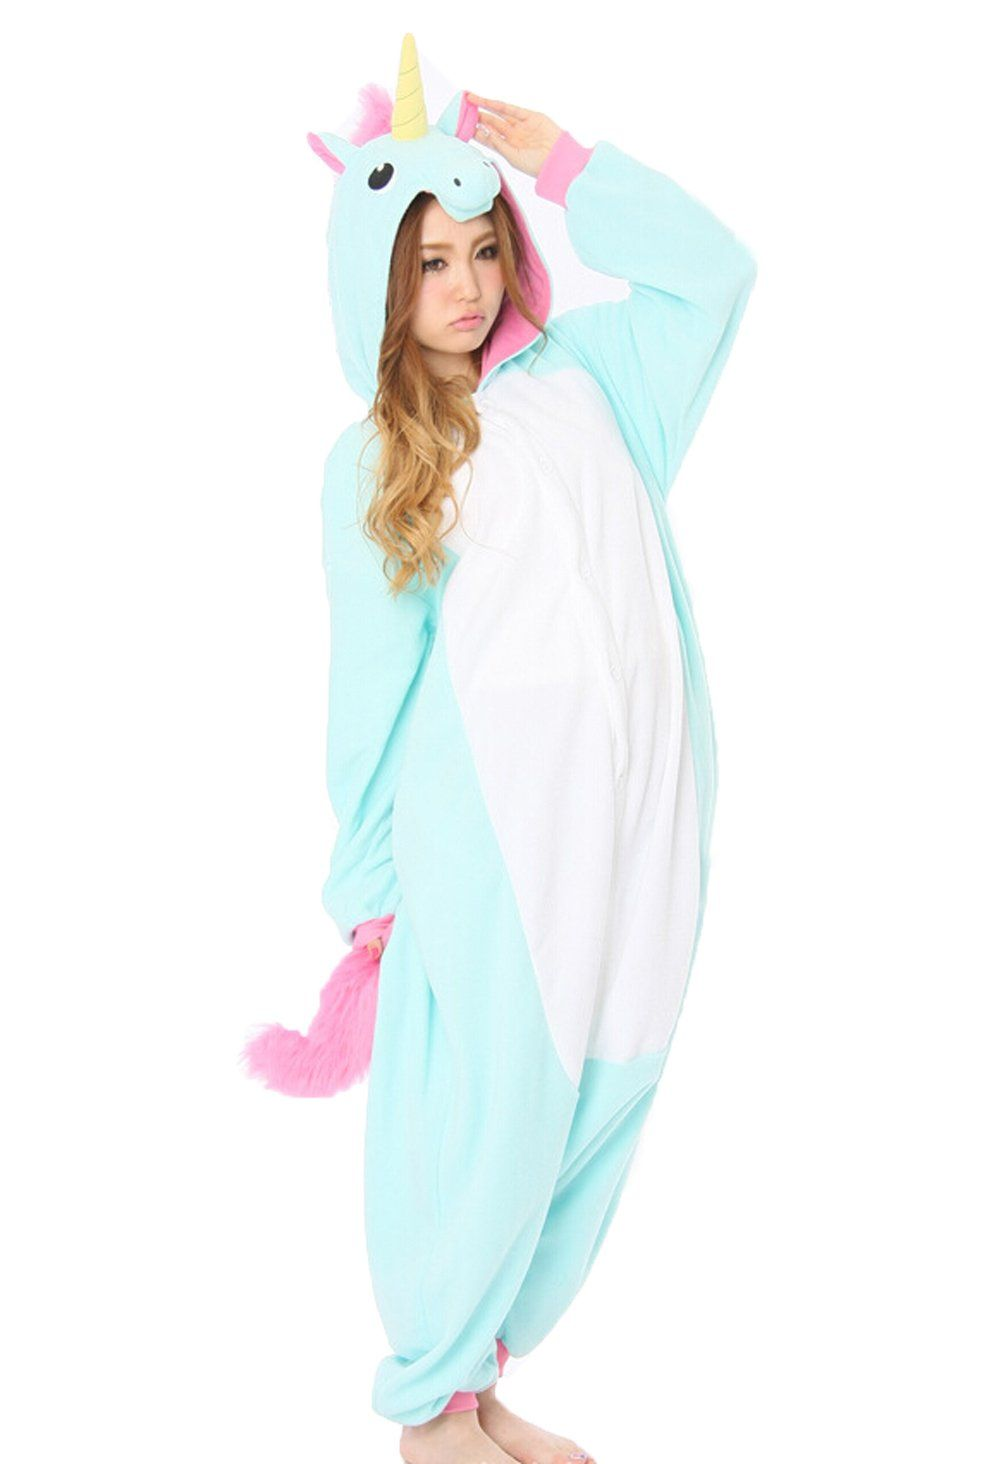 Yarbar Tier Onesies Karneval Halloween Kostüm Nachtwäsche Cosplay Pyjama Erwachsene Unisex Kigurumi Jumpsuit Blaue Einhorn